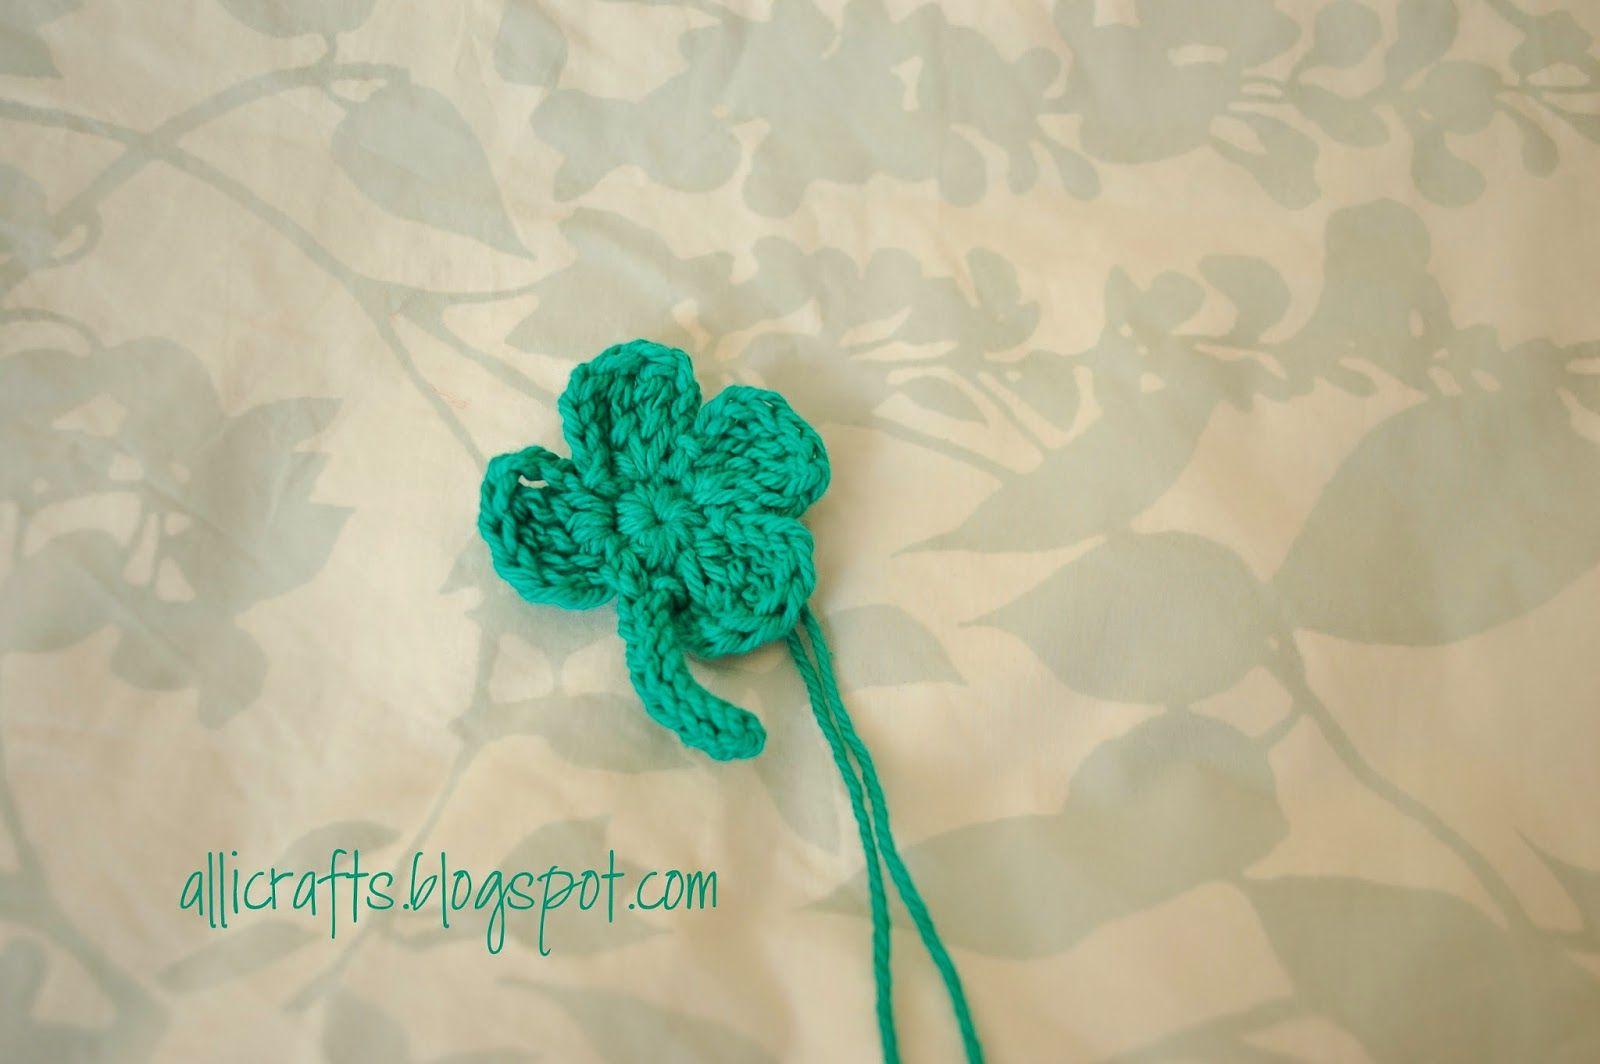 Alli Crafts: Free Crochet Pattern: Shamrock Applique   Crochet - St ...